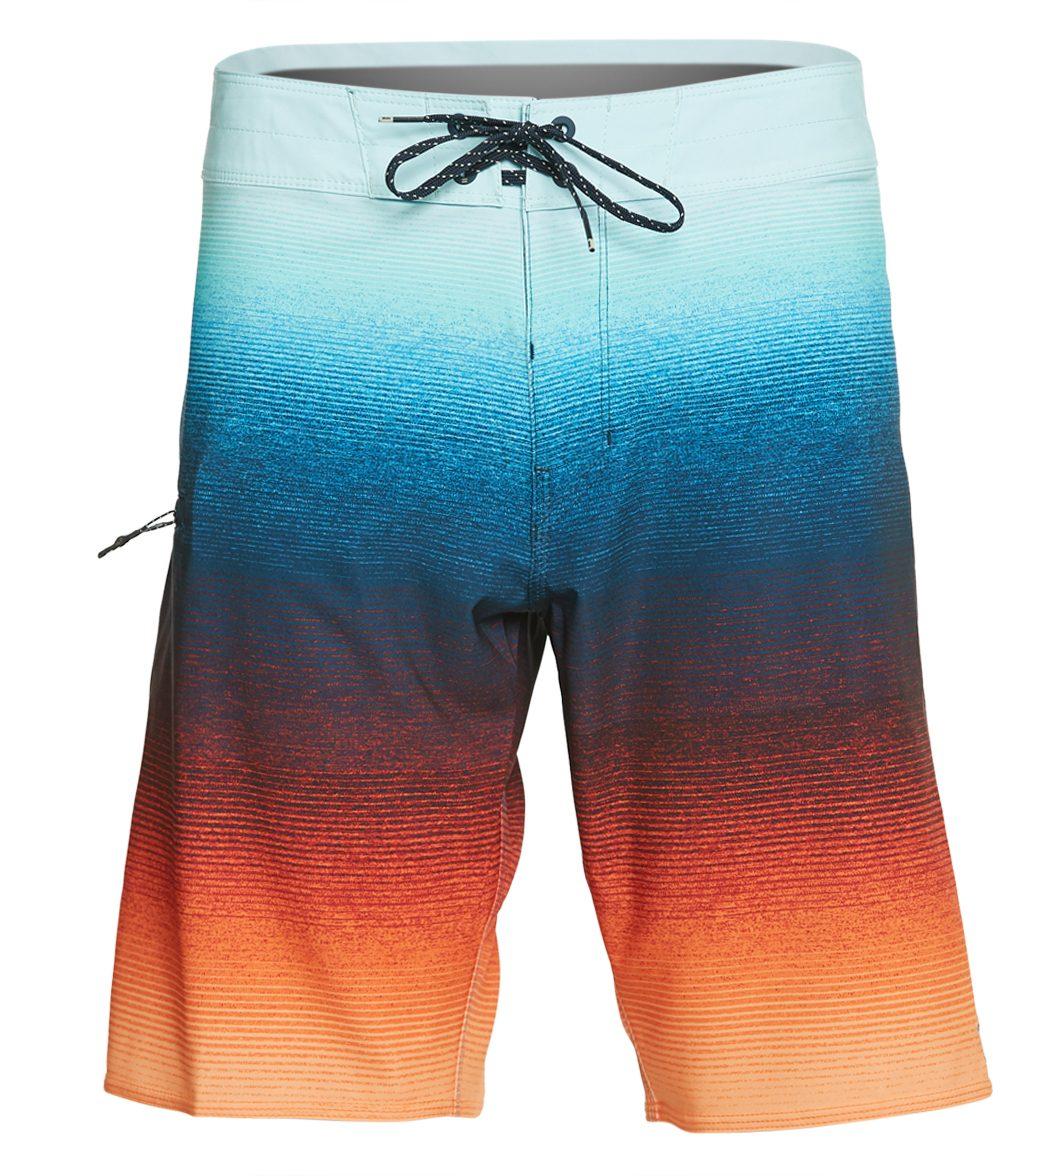 Billabong Men's Fluid Airlite Boardshort